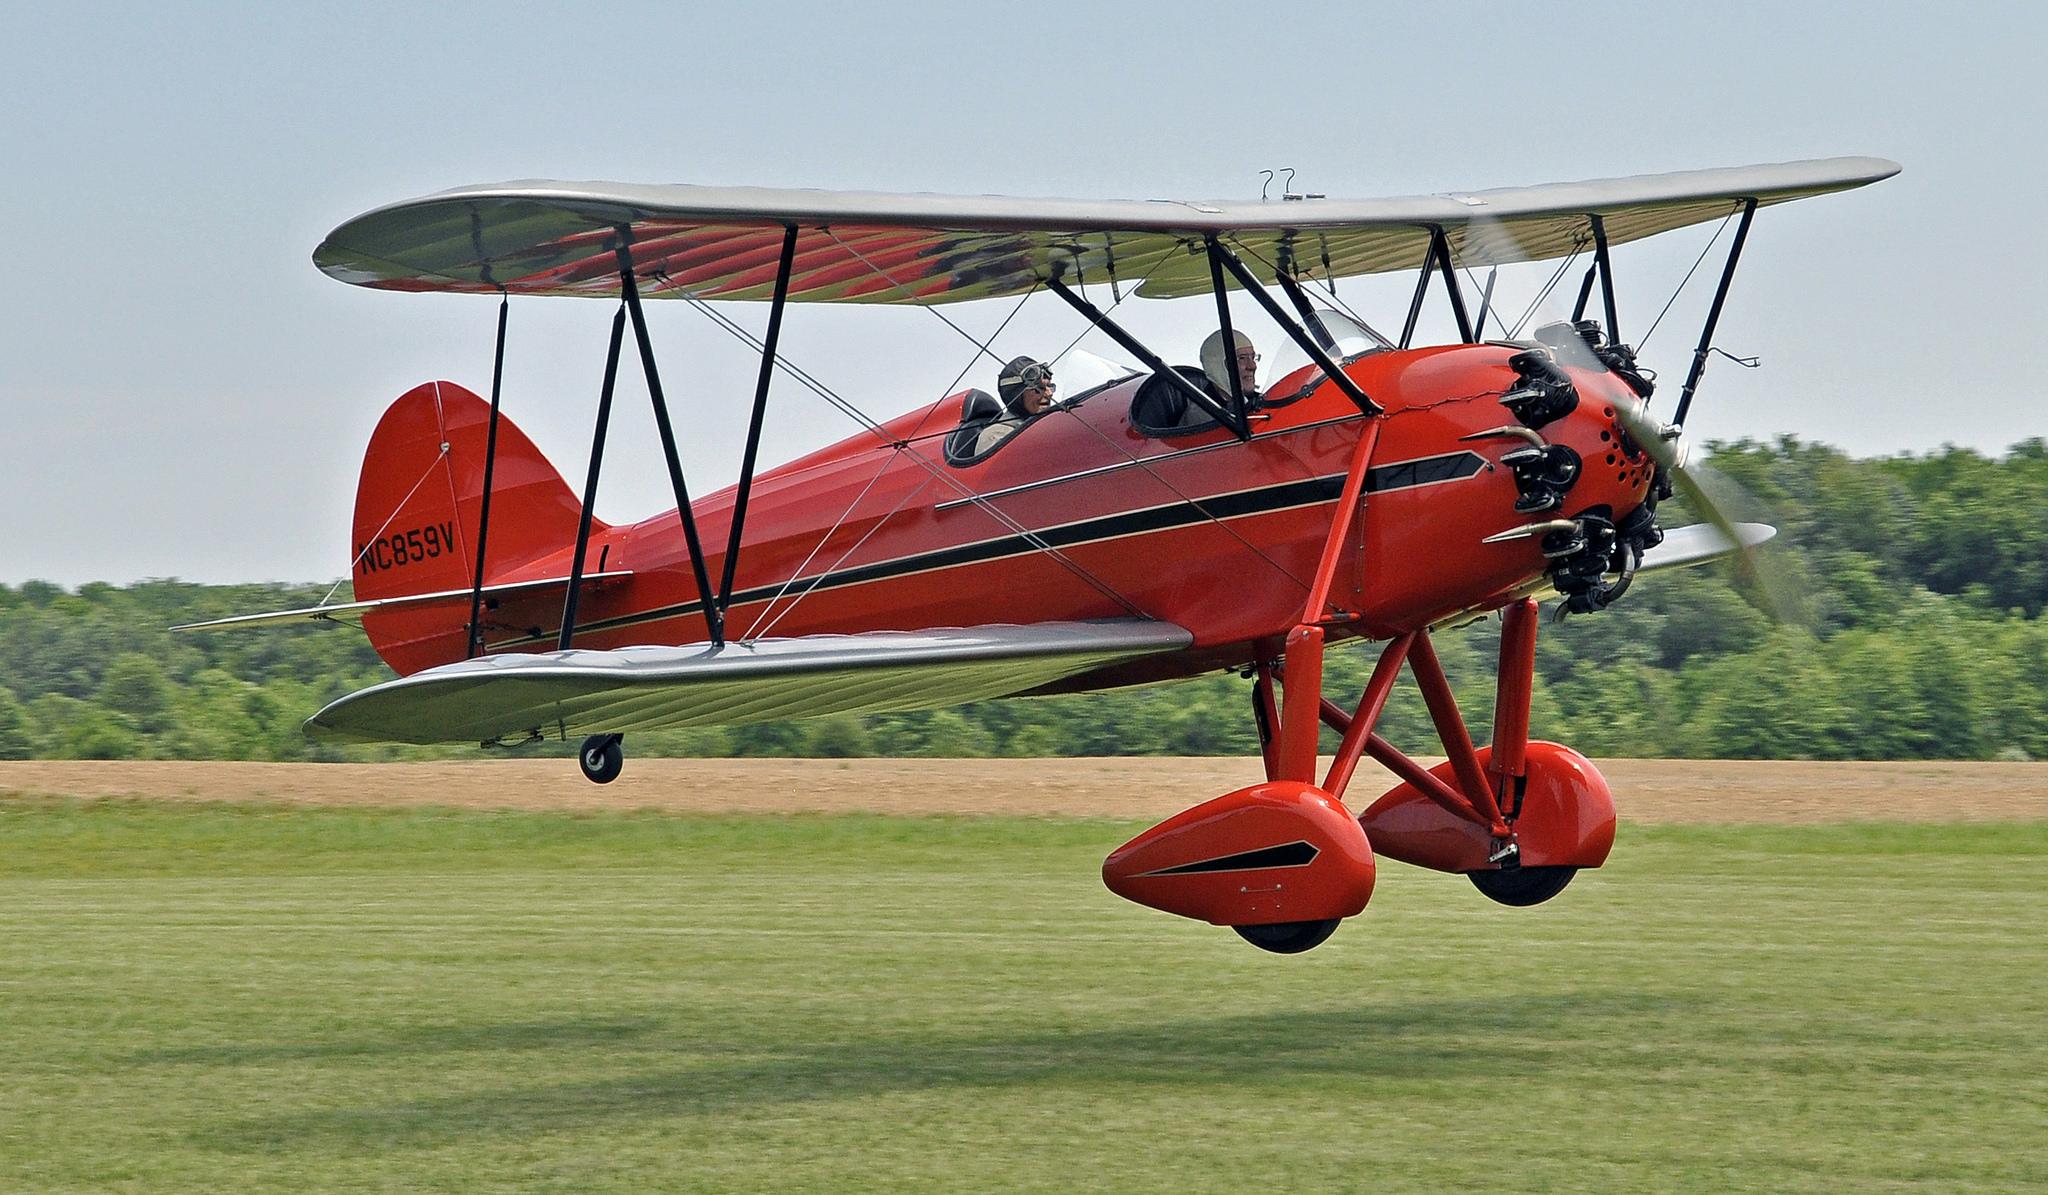 1930 WACO Biplane takes off from Massey Aerodrome